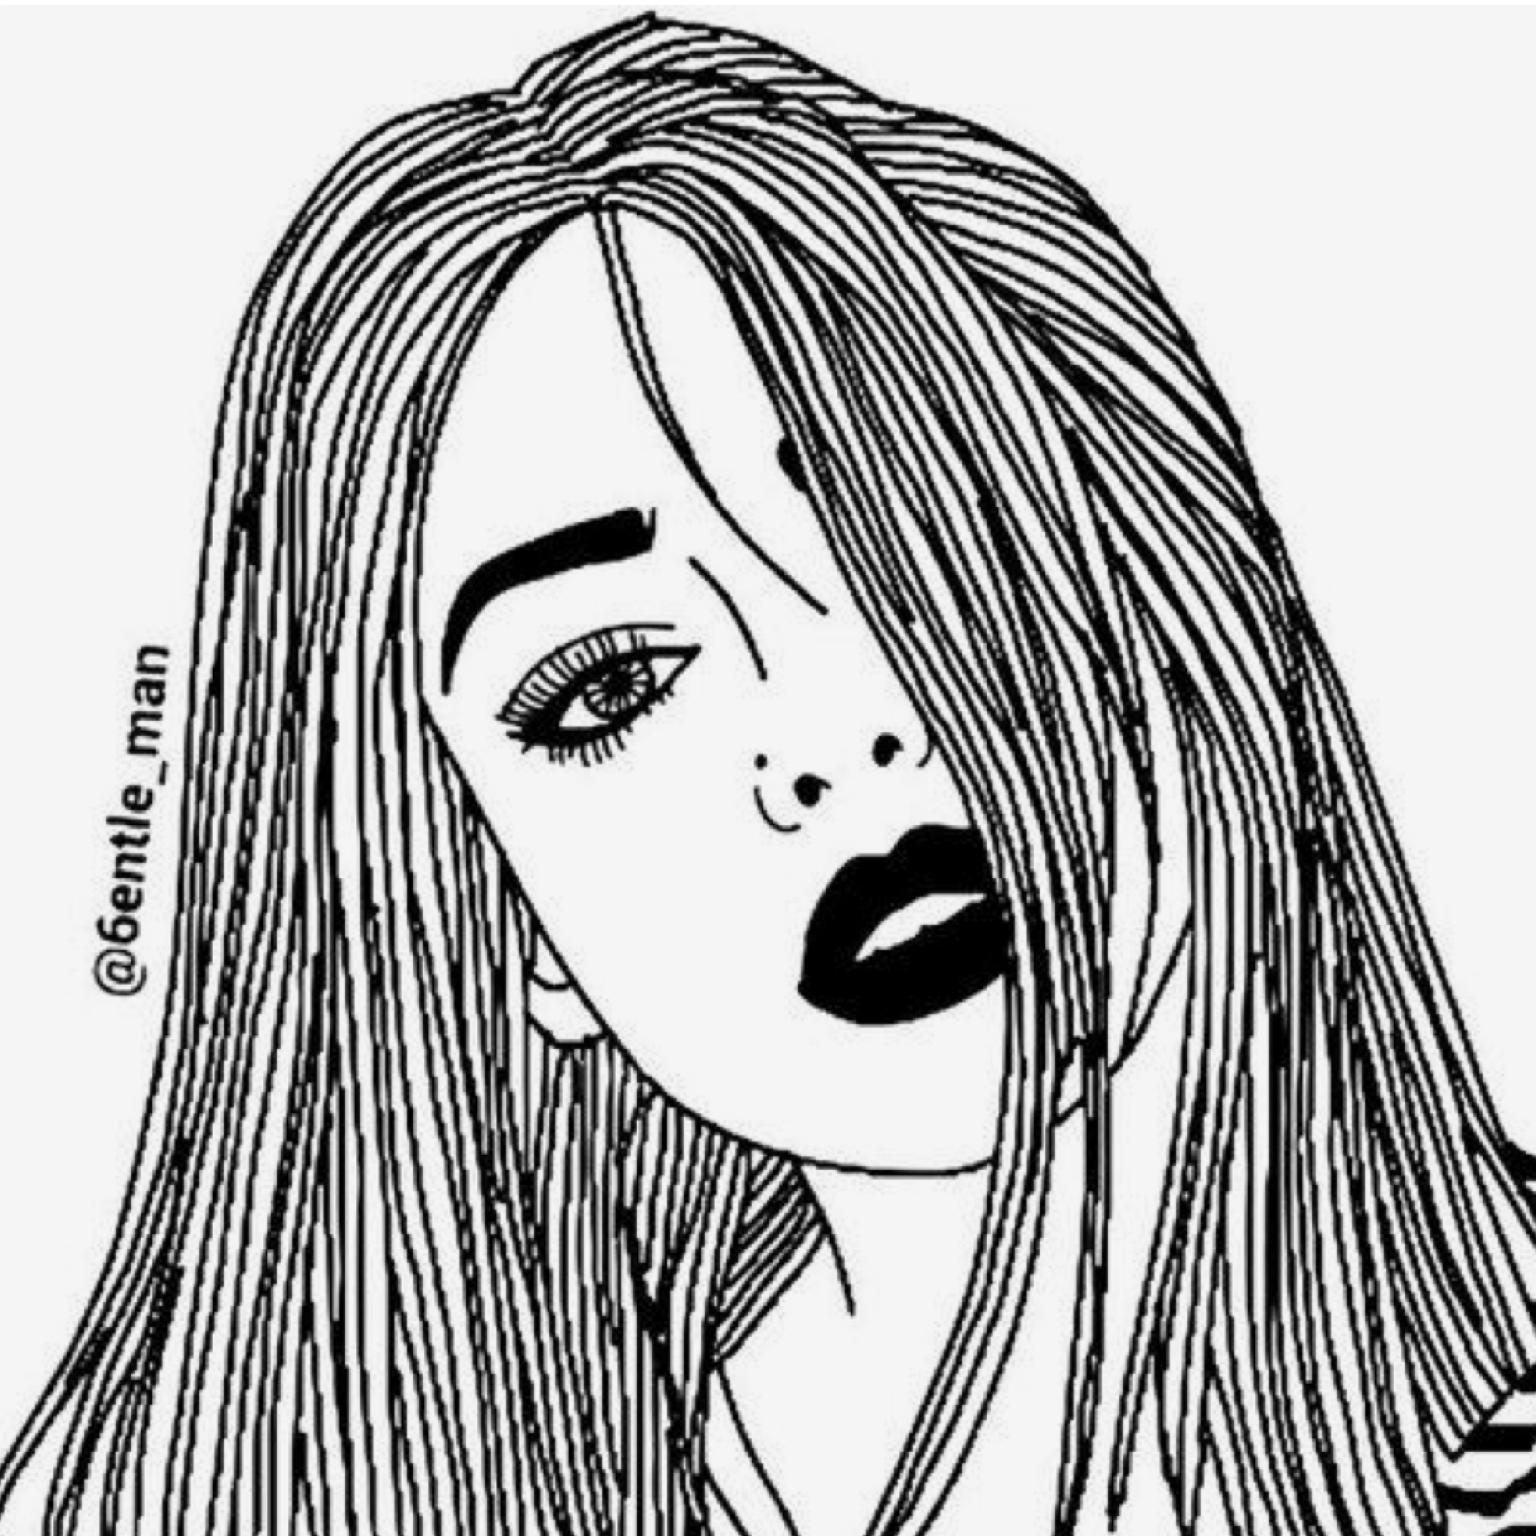 🐼 Romero 🇨🇴